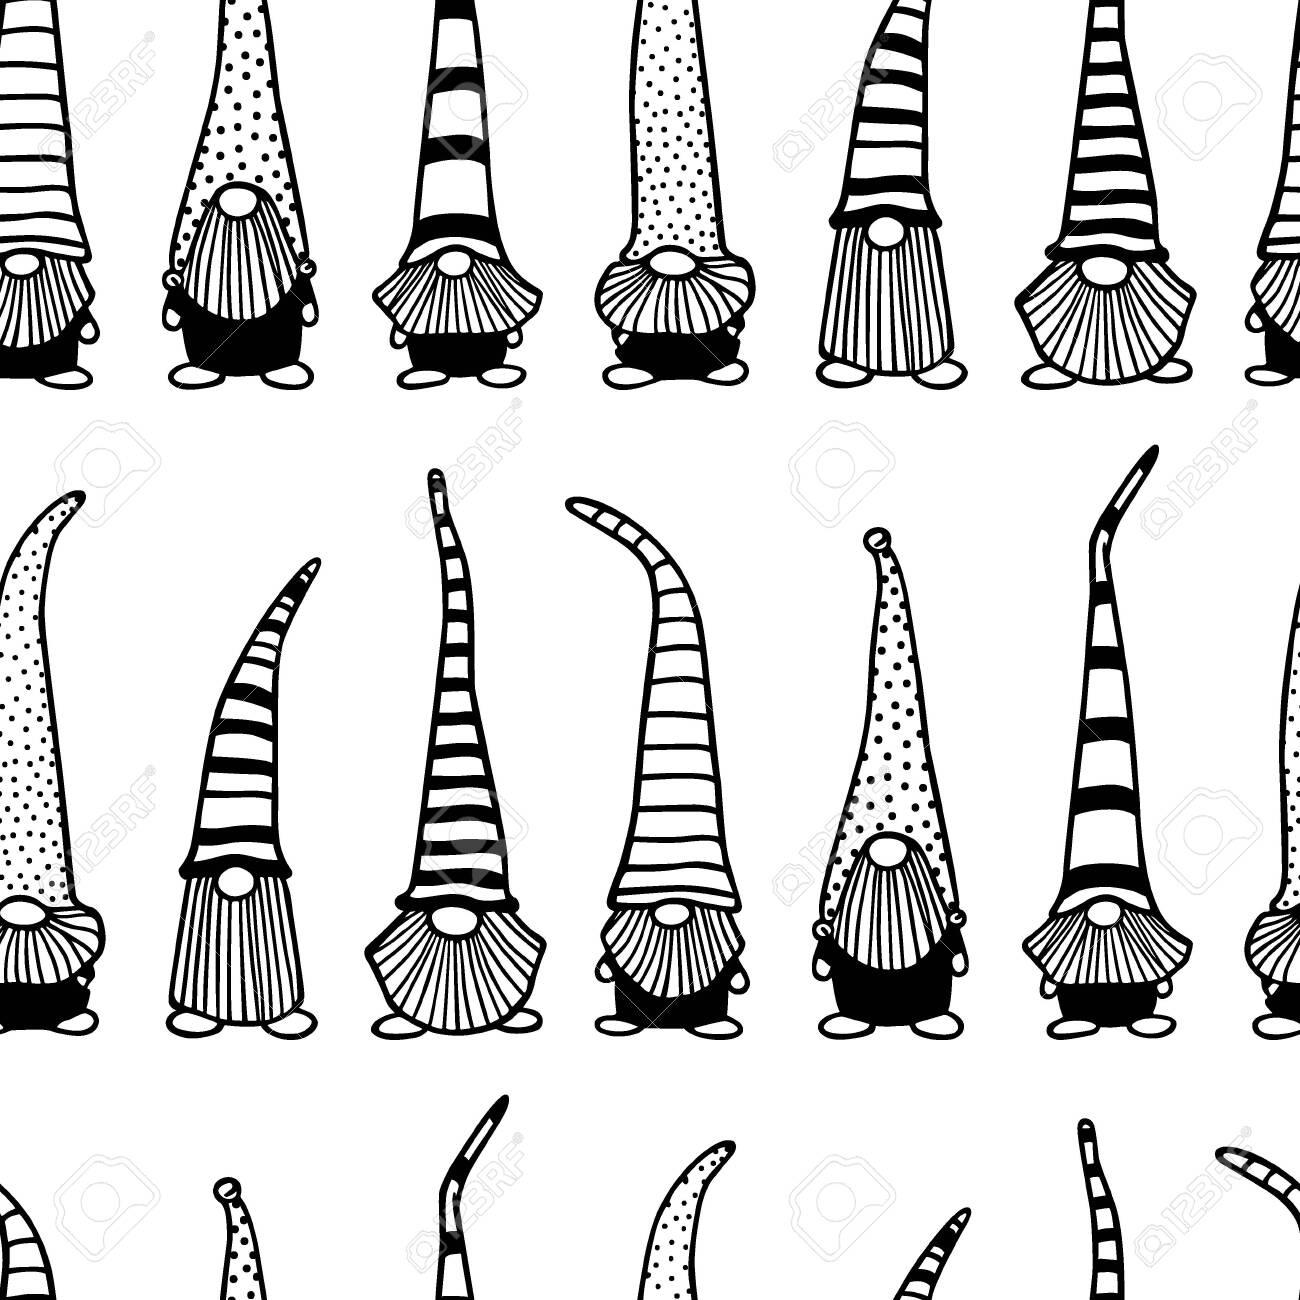 Hand drawn Christmas gnomes pattern - 136320244